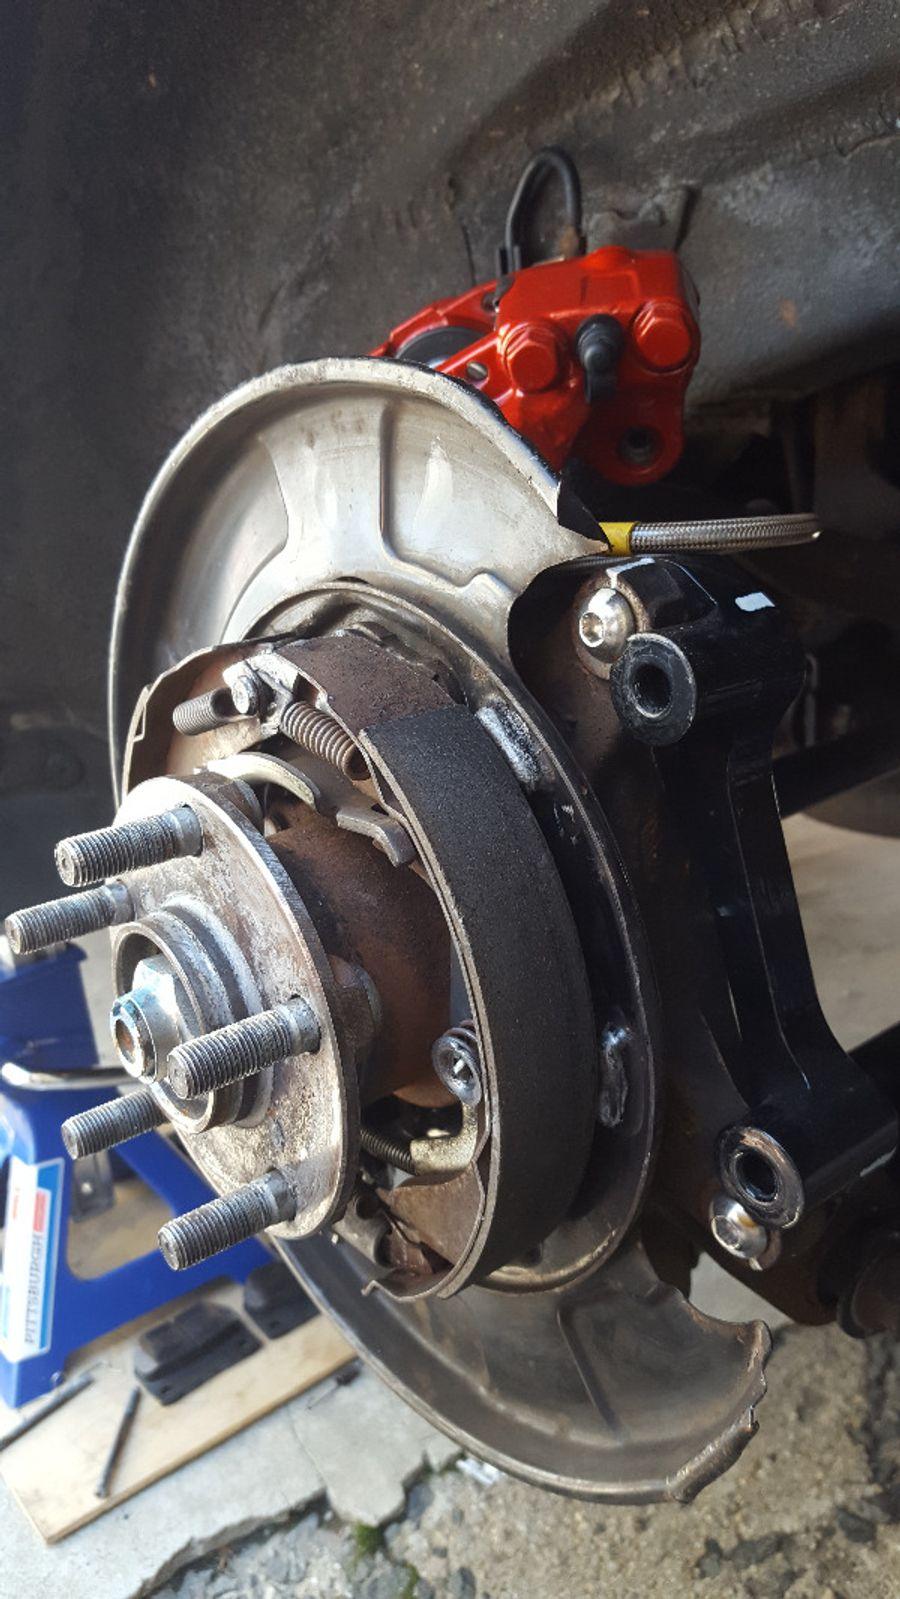 Torque Solution Rear Brake Caliper Adapter for Subaru Impreza RS WRX Forester